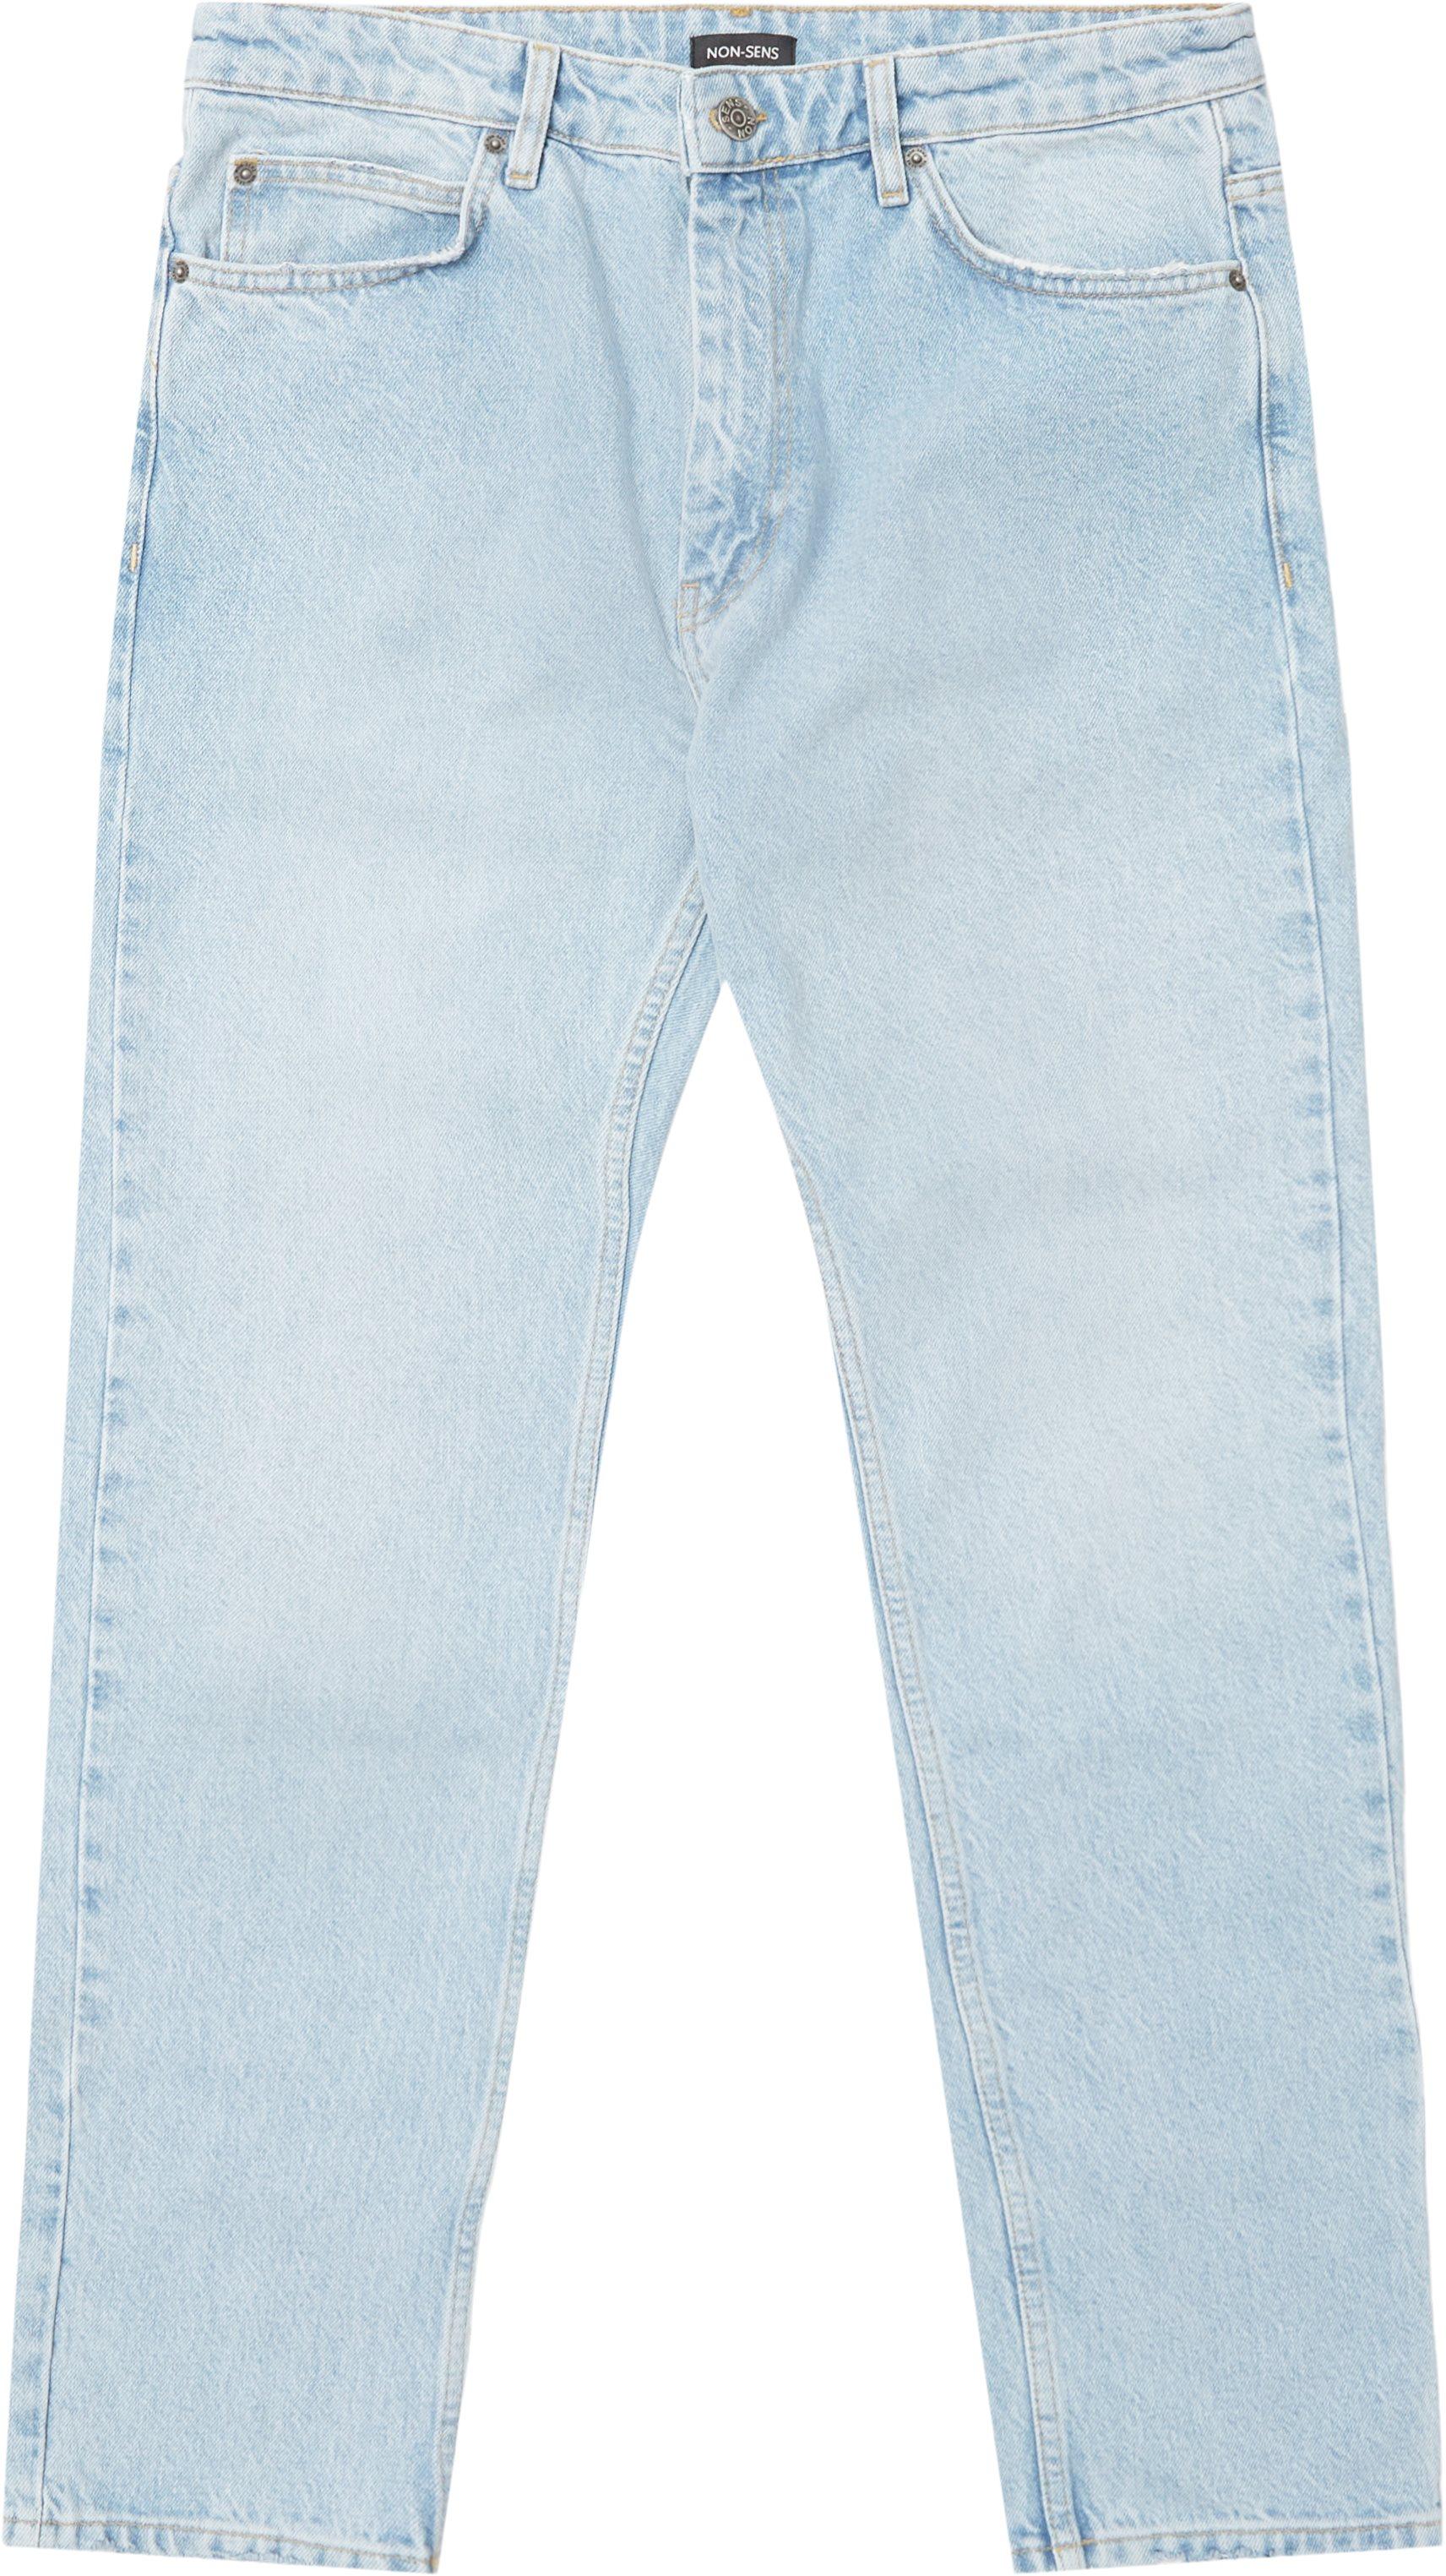 Montana Jeans - Jeans - Straight fit - Denim